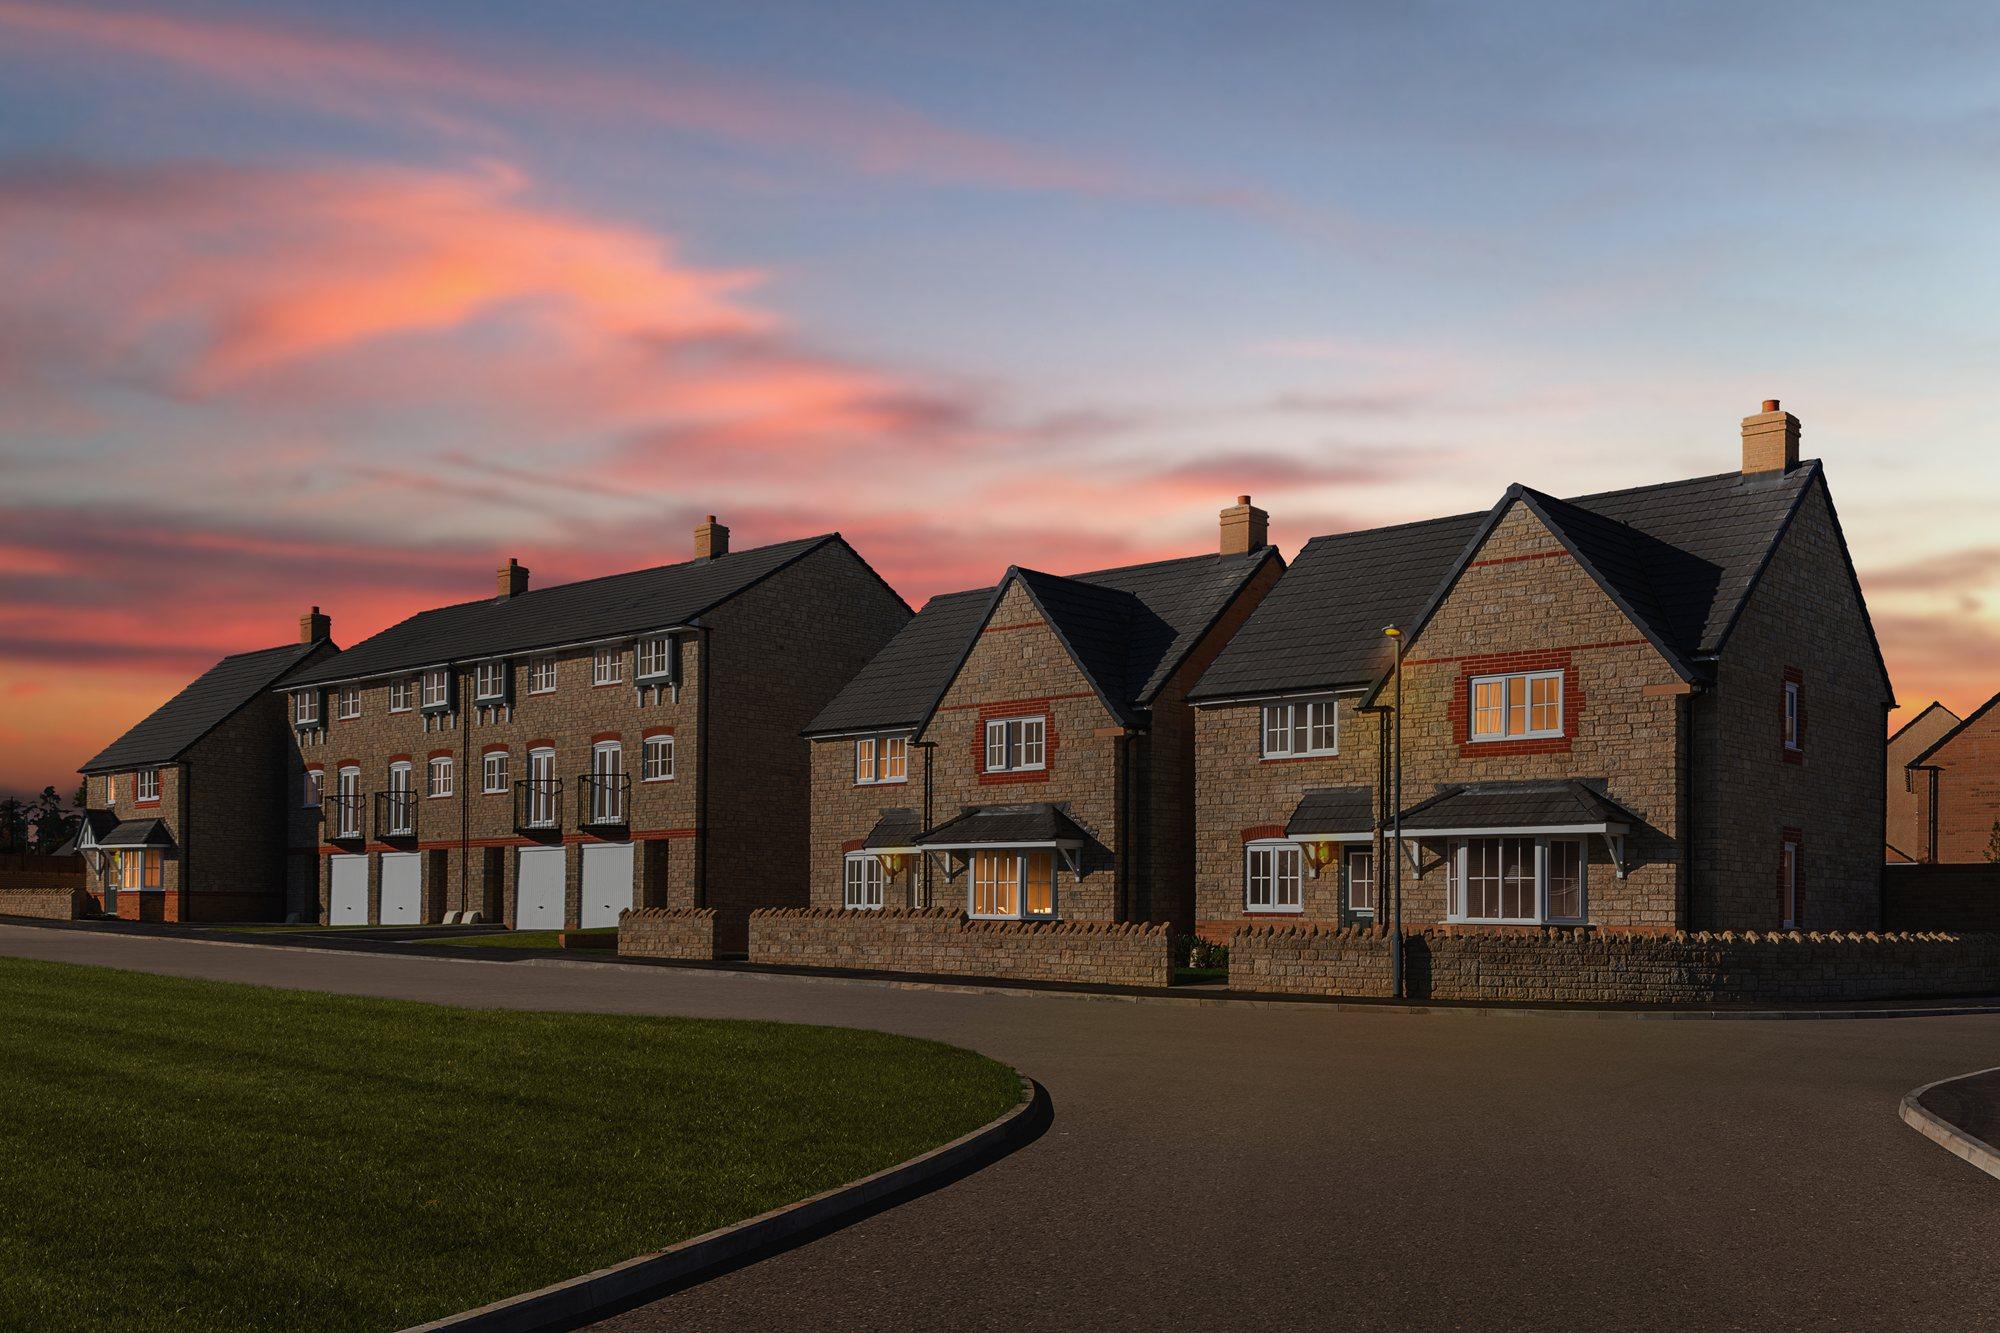 New Build Homes in Radstock